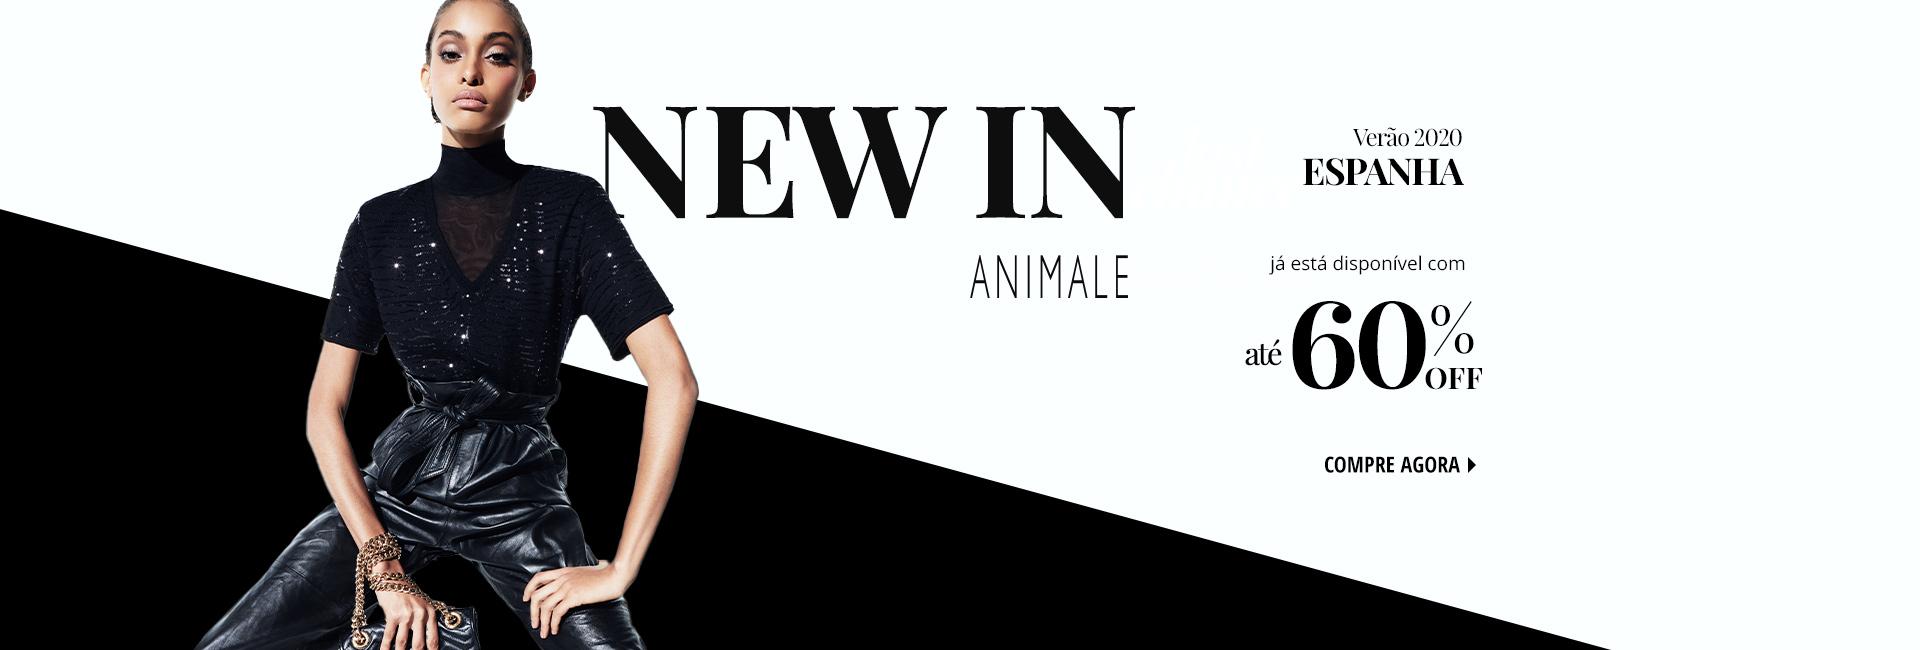 Lançamento Animale